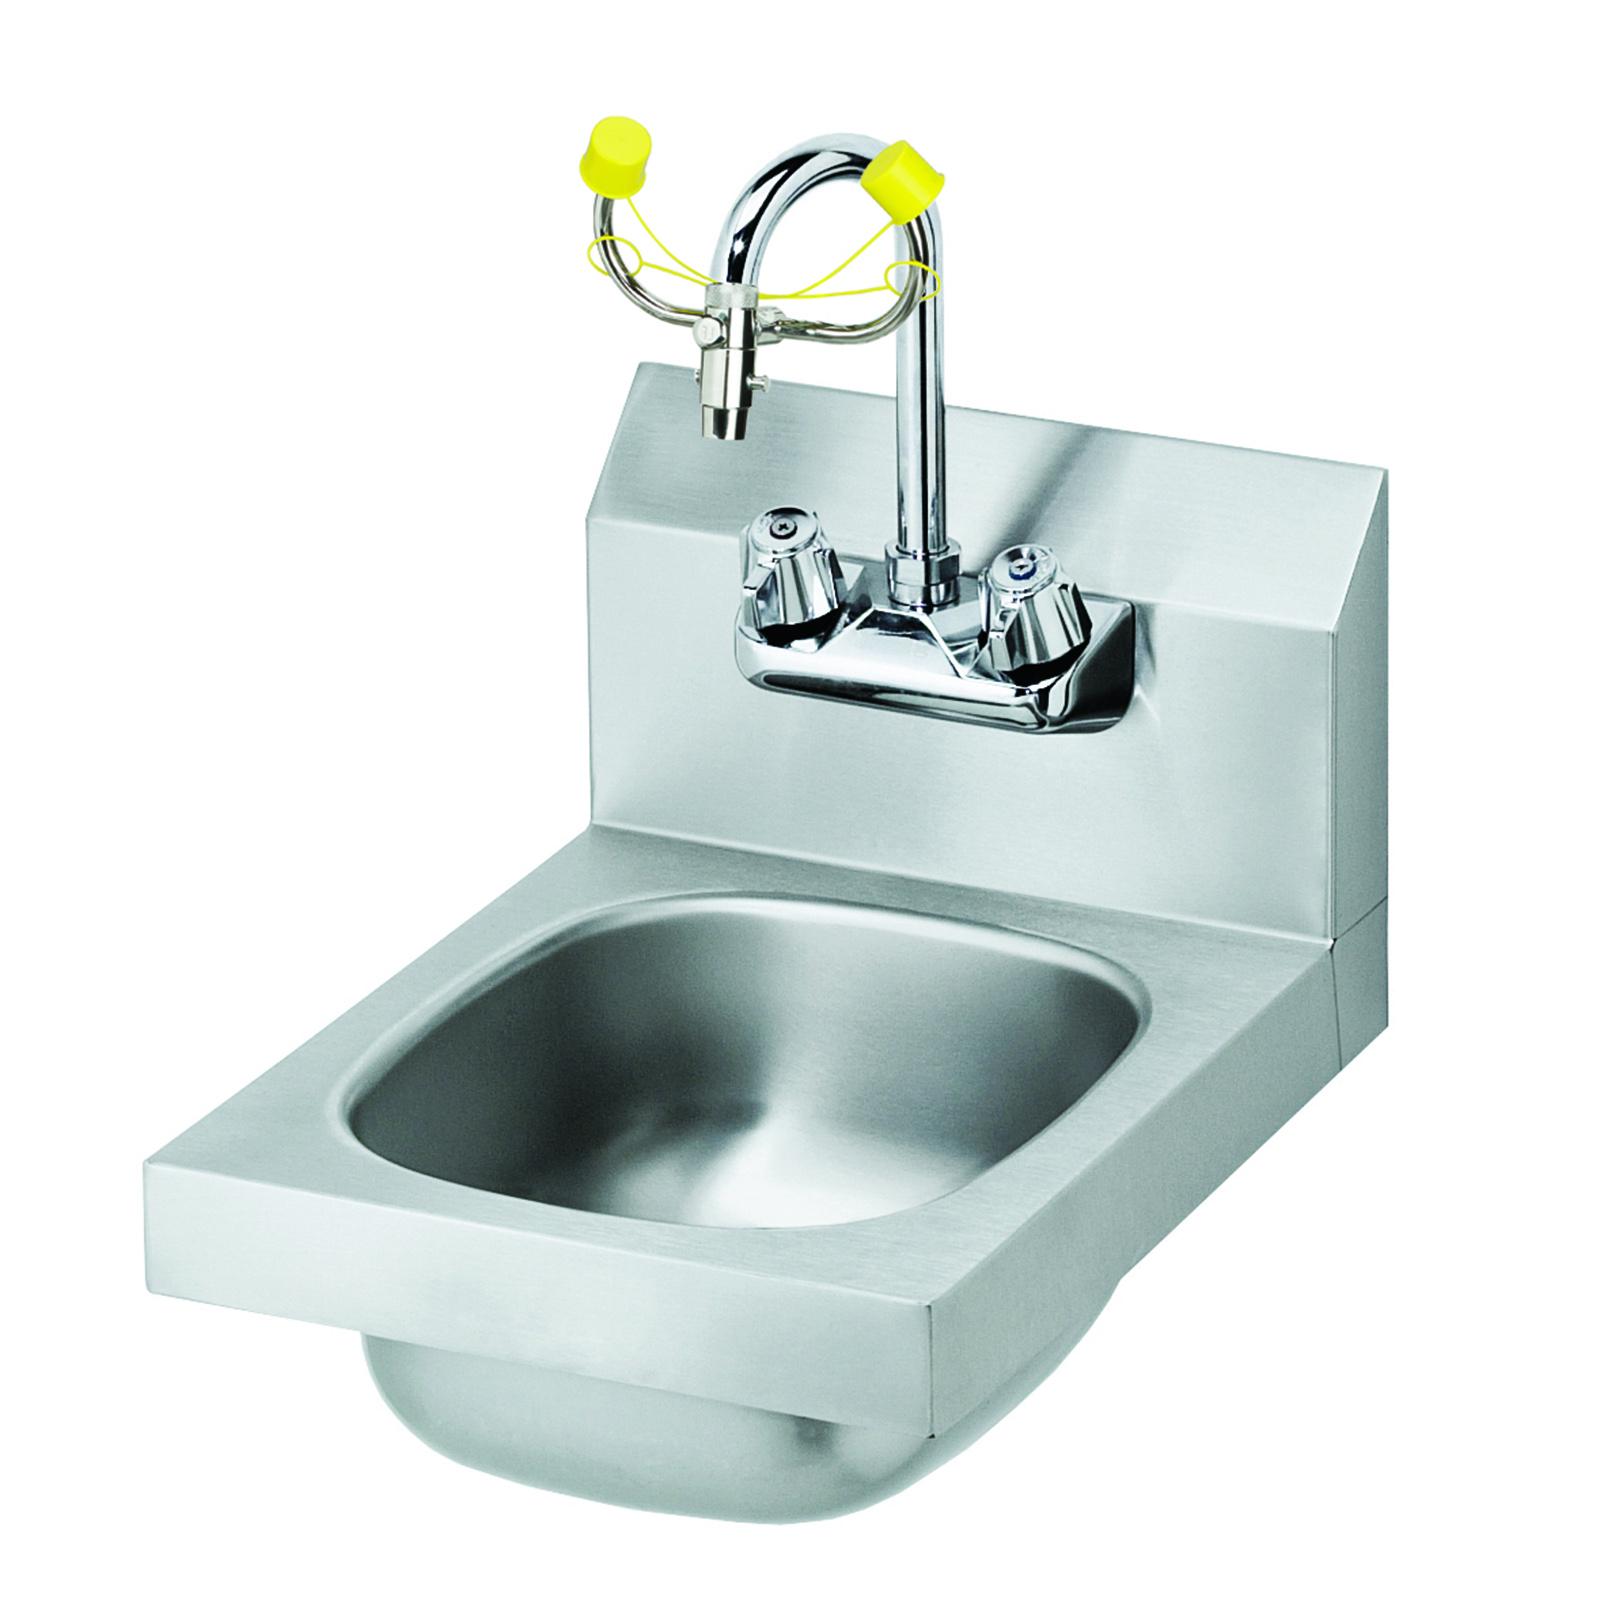 Krowne Metal HS-35 Hand Sink/Eyewash wall mount | CKitchen.com